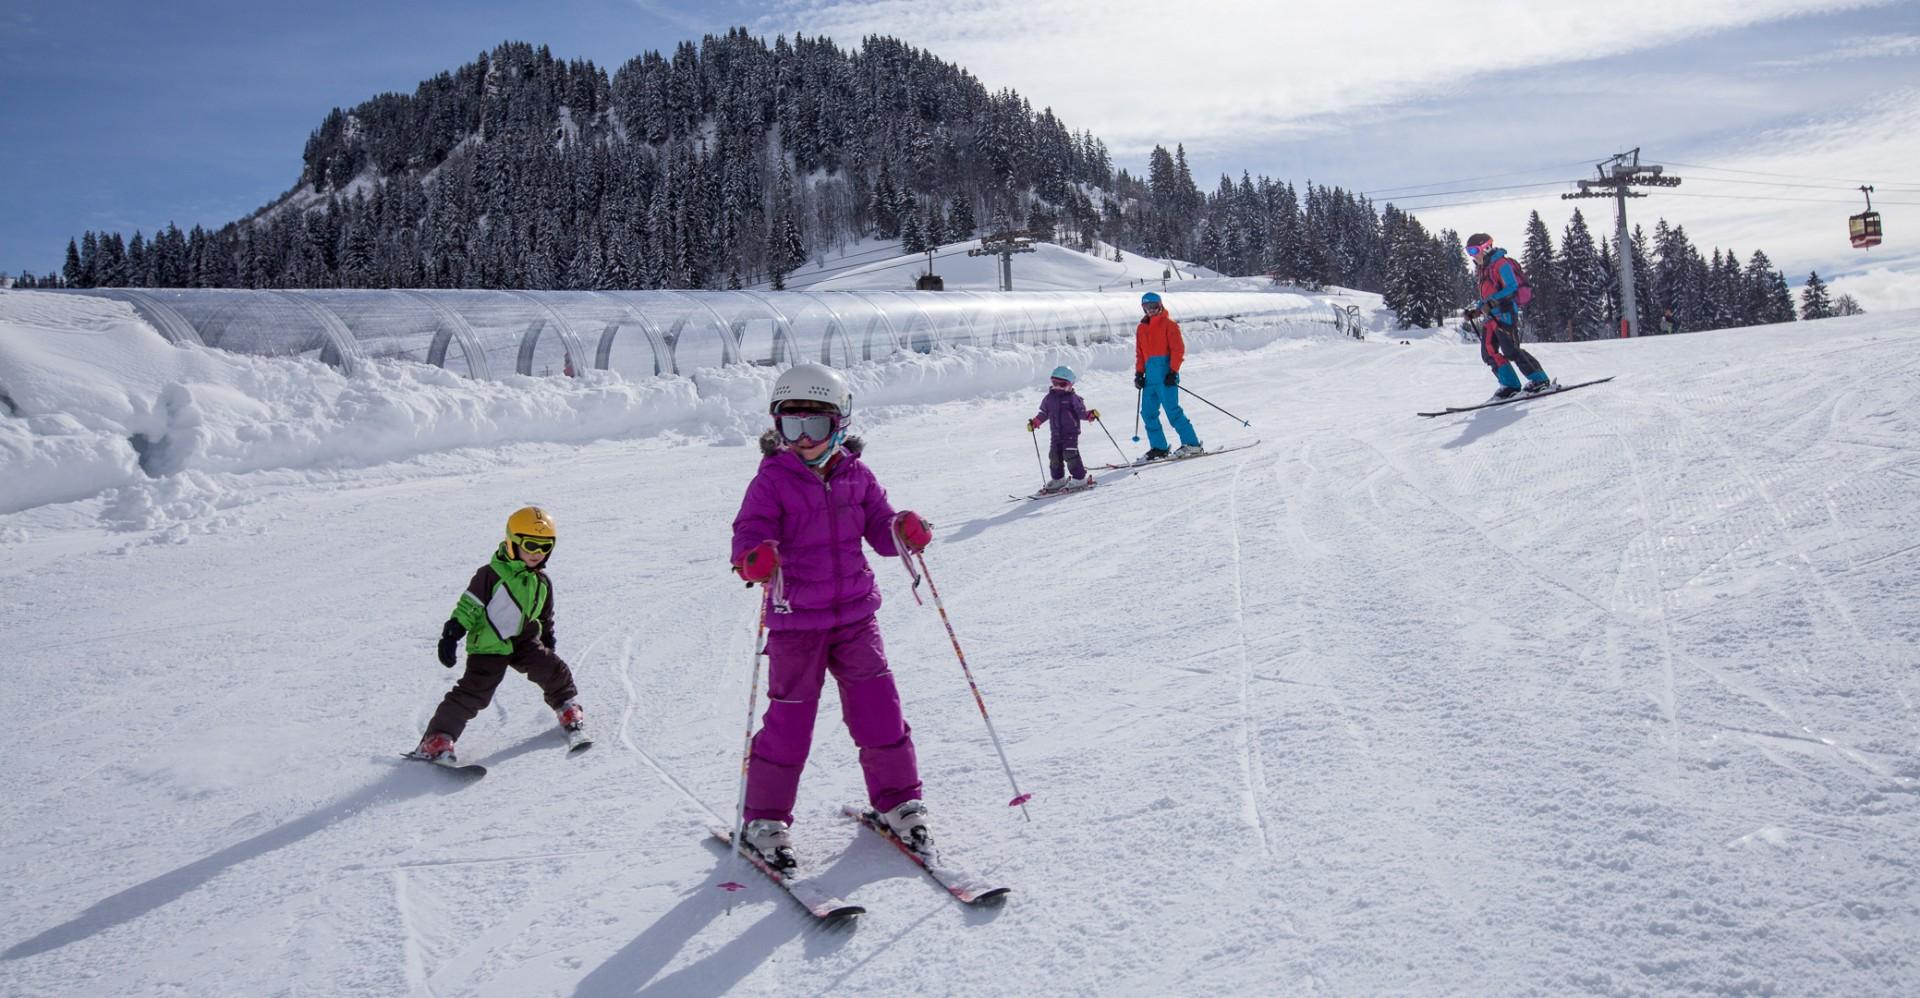 h17-3175-ski-m-a-verpaelst-le-grand-bornand-2233